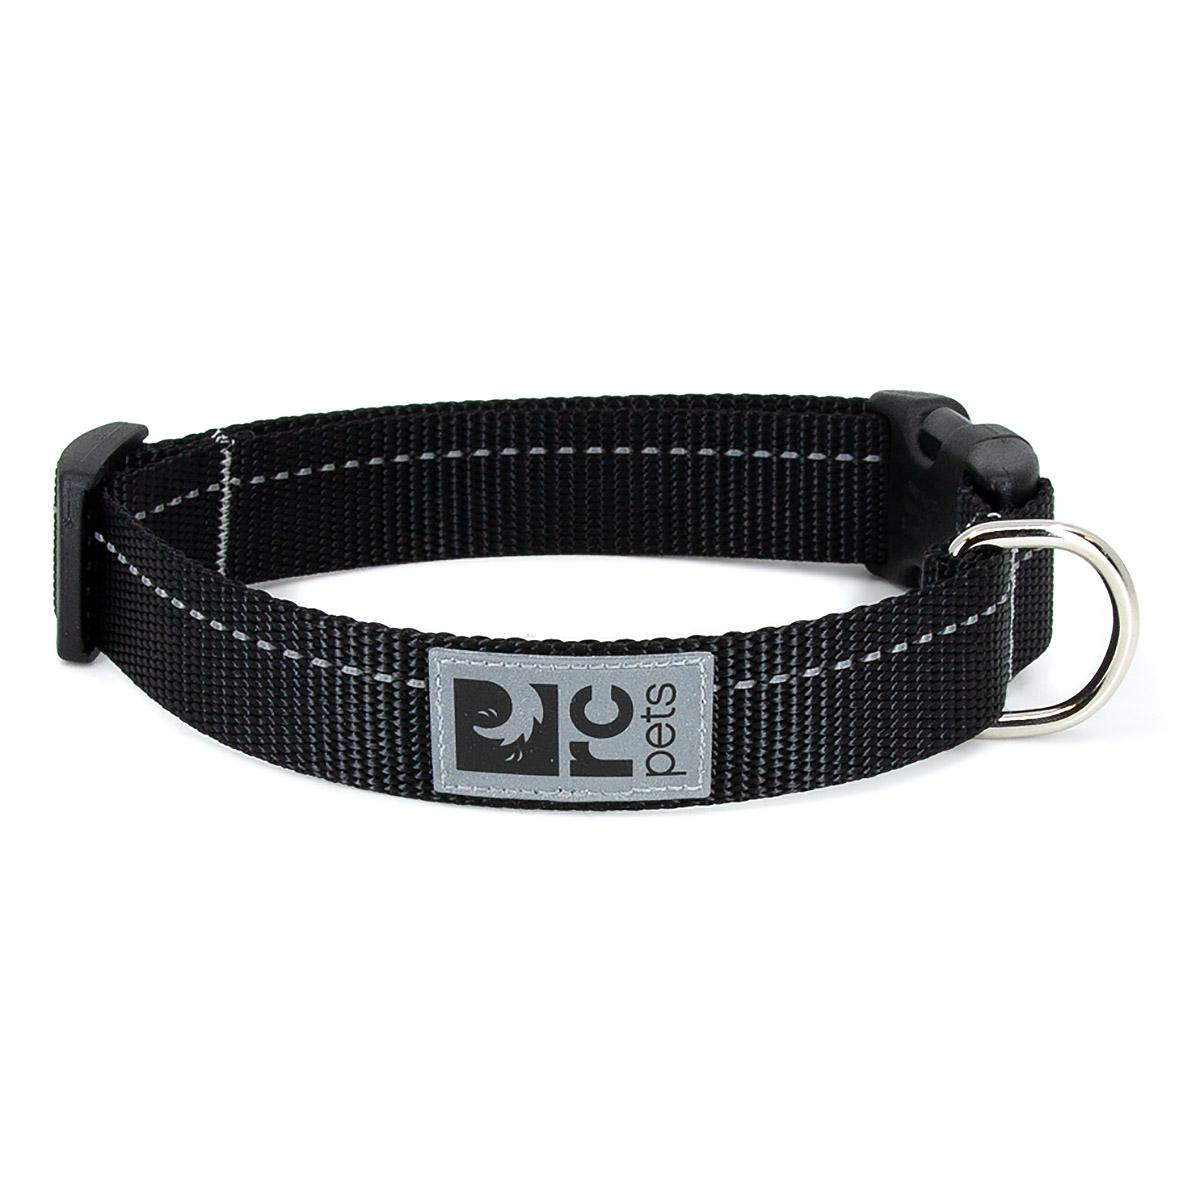 Primary Clip Dog Collar - Black